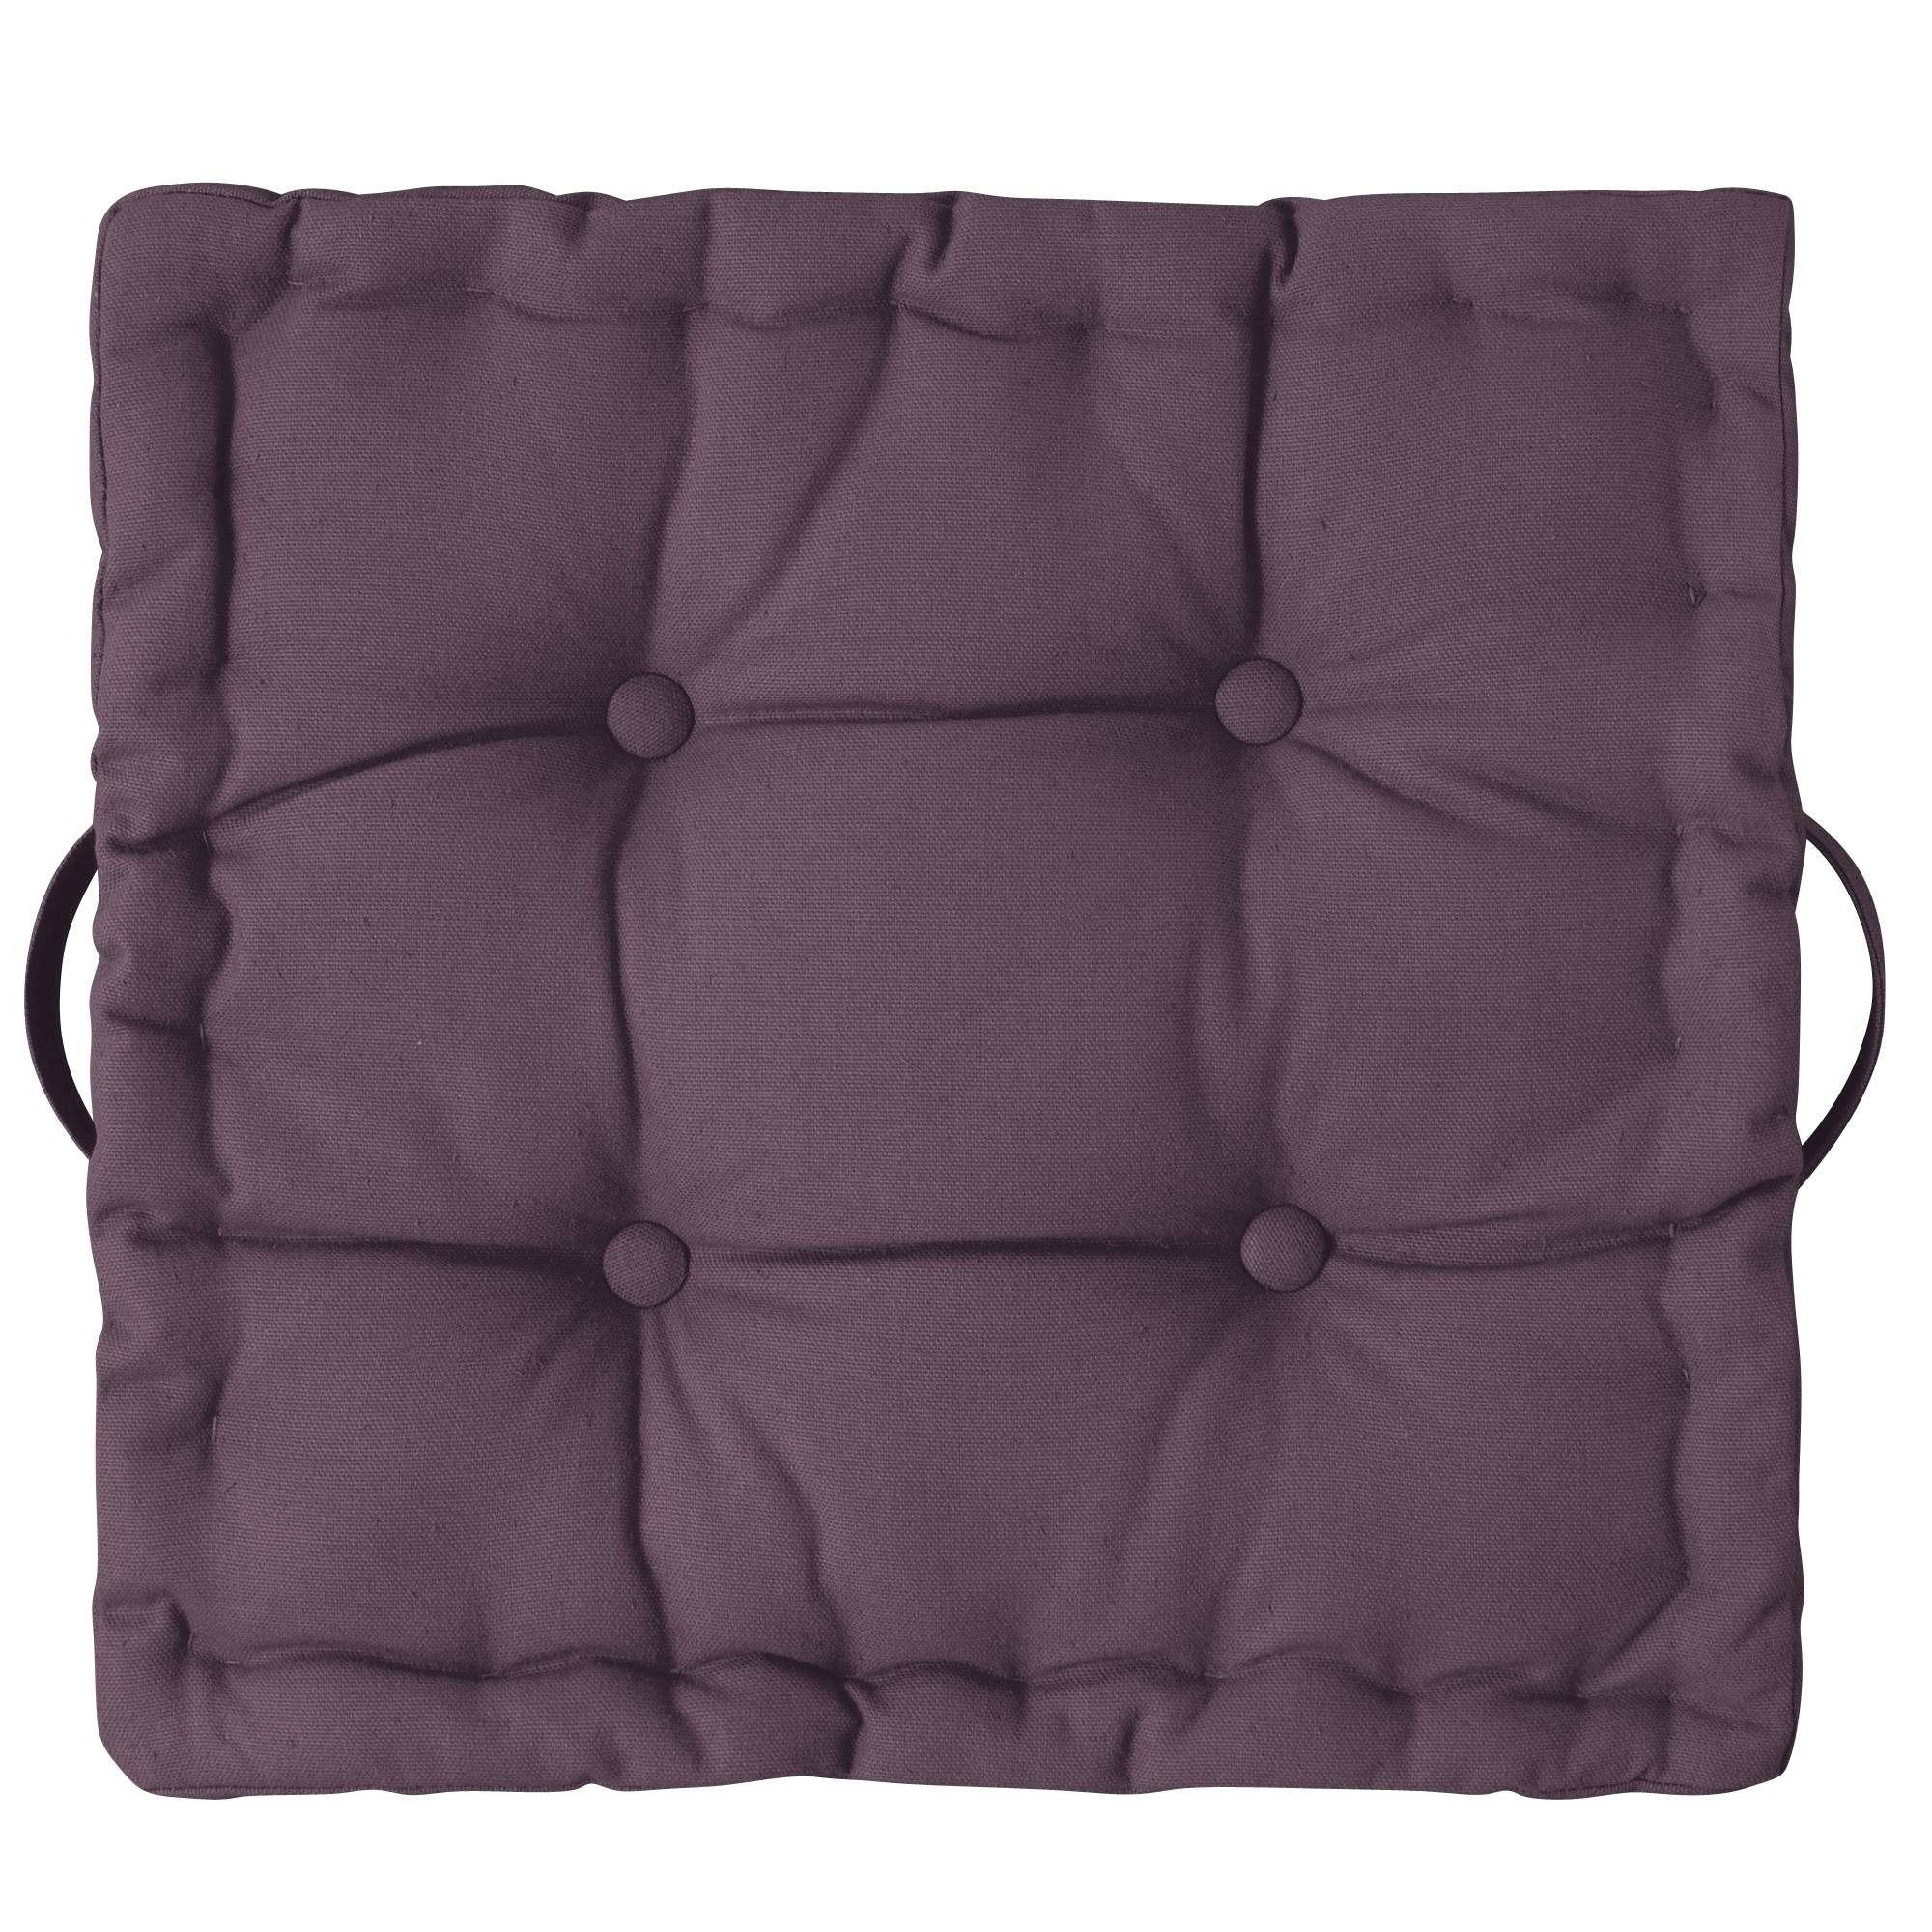 grand coussin tapissier uni carr tertio 3 suisses. Black Bedroom Furniture Sets. Home Design Ideas